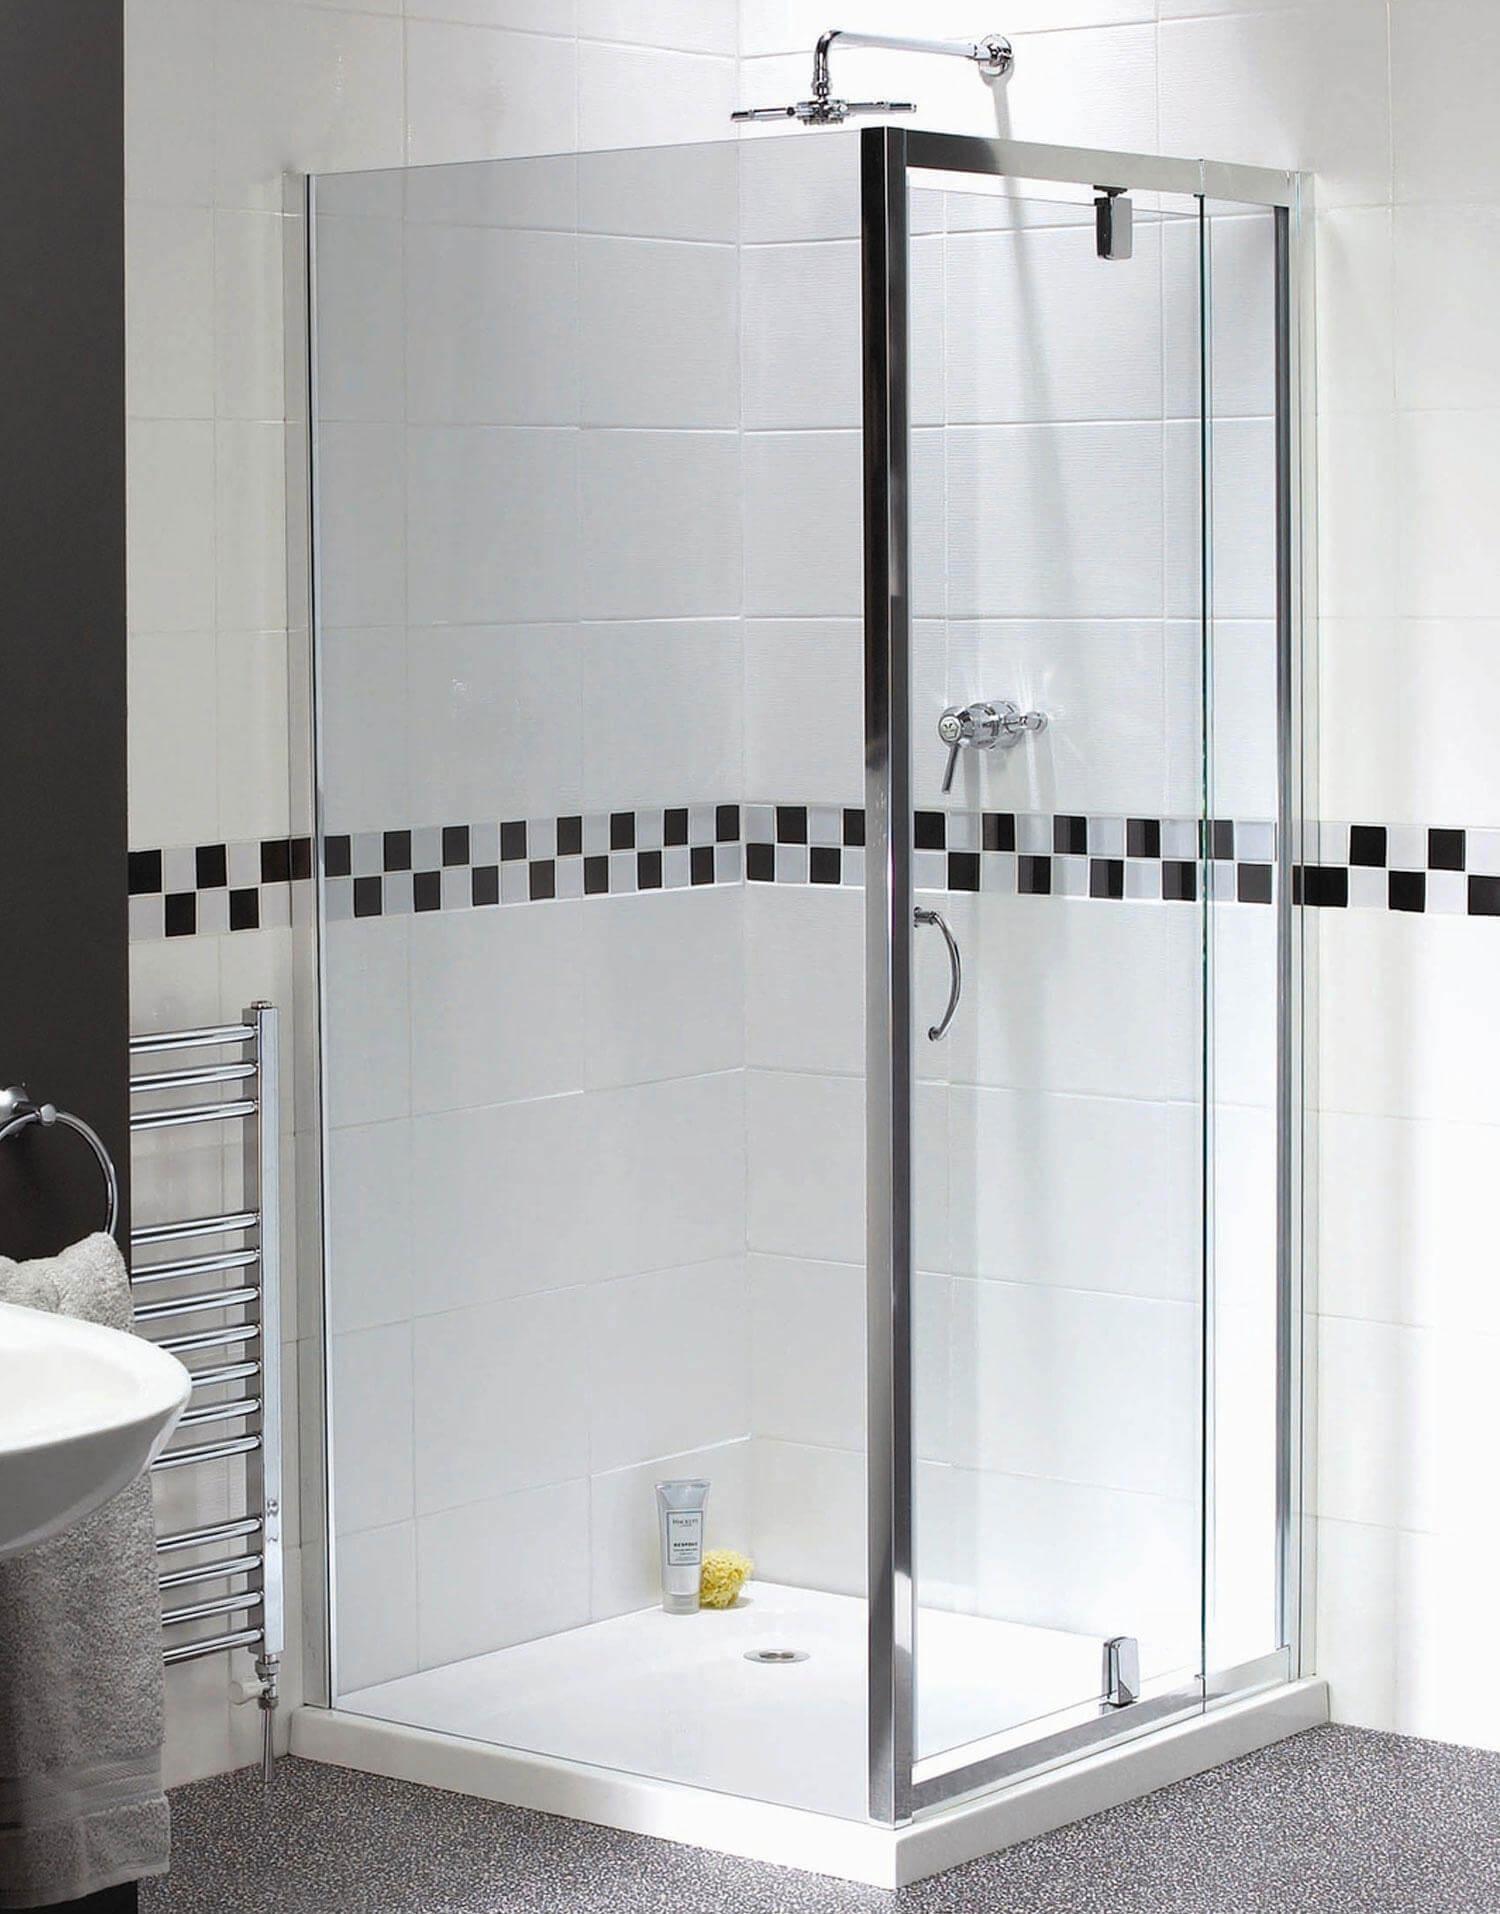 Aqualux Shine Telescopic Pivot Shower Door 760 900mm Fen0894aqu